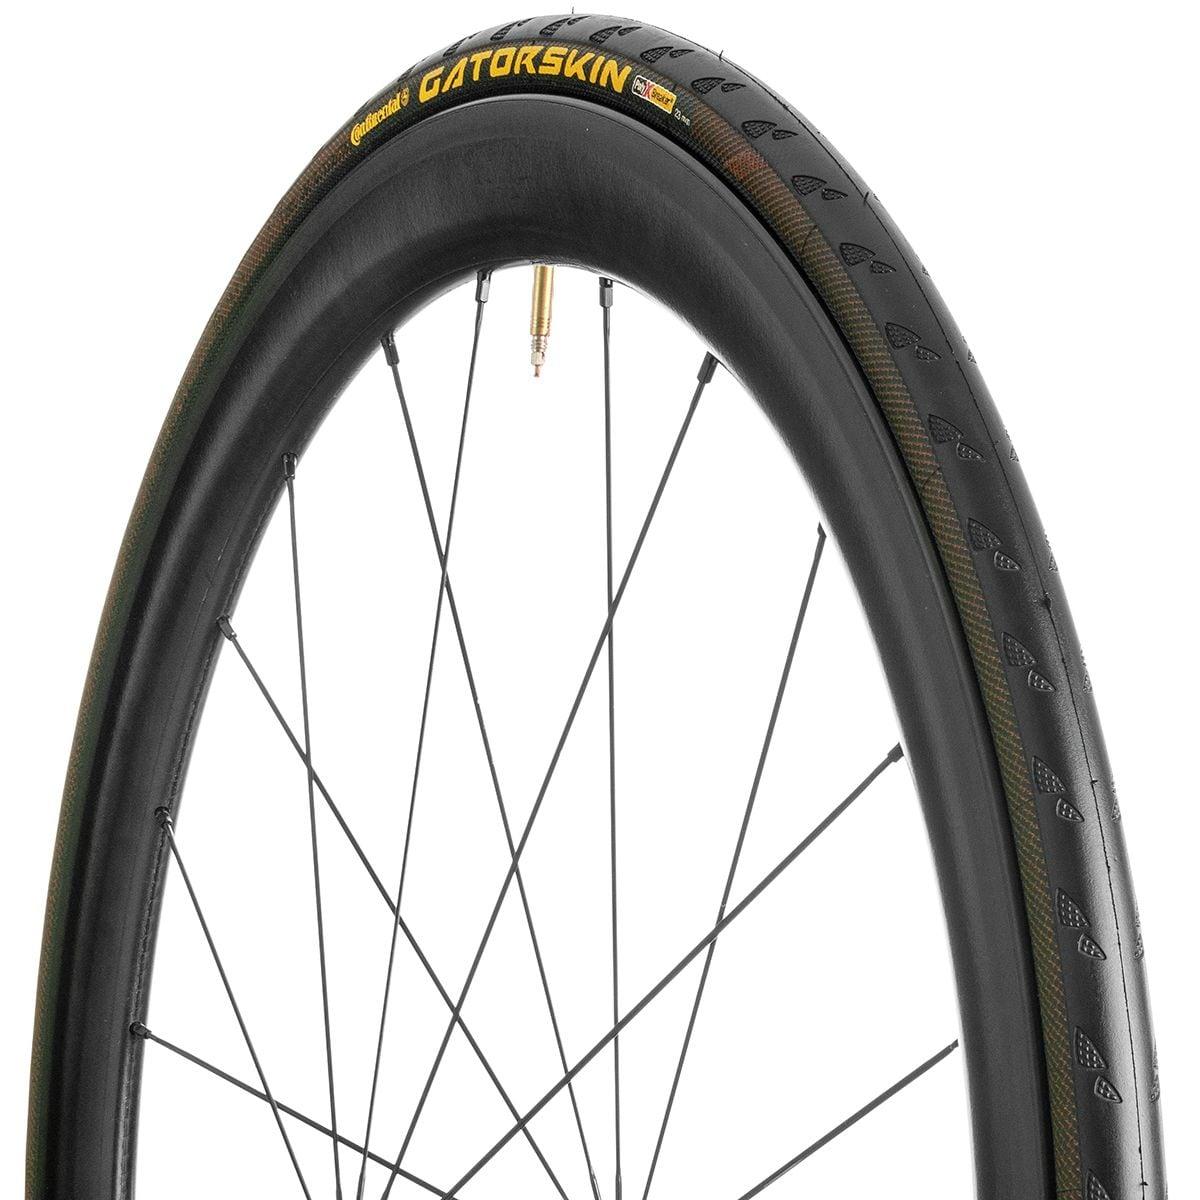 Continental Gatorskin Tire Clincher Competitive Cyclist